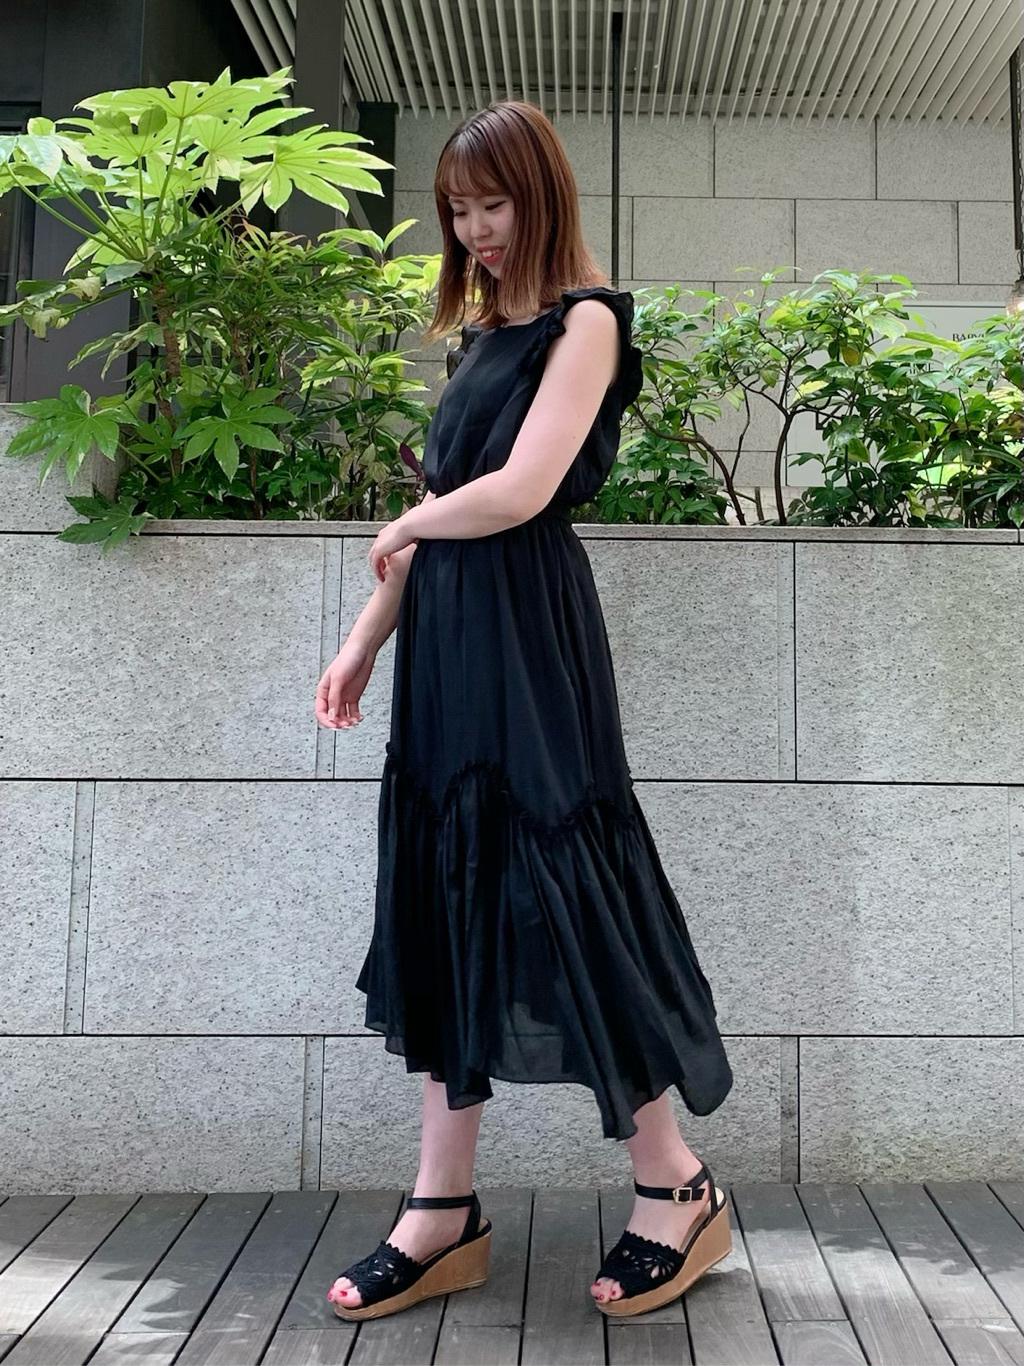 umika (164cm)